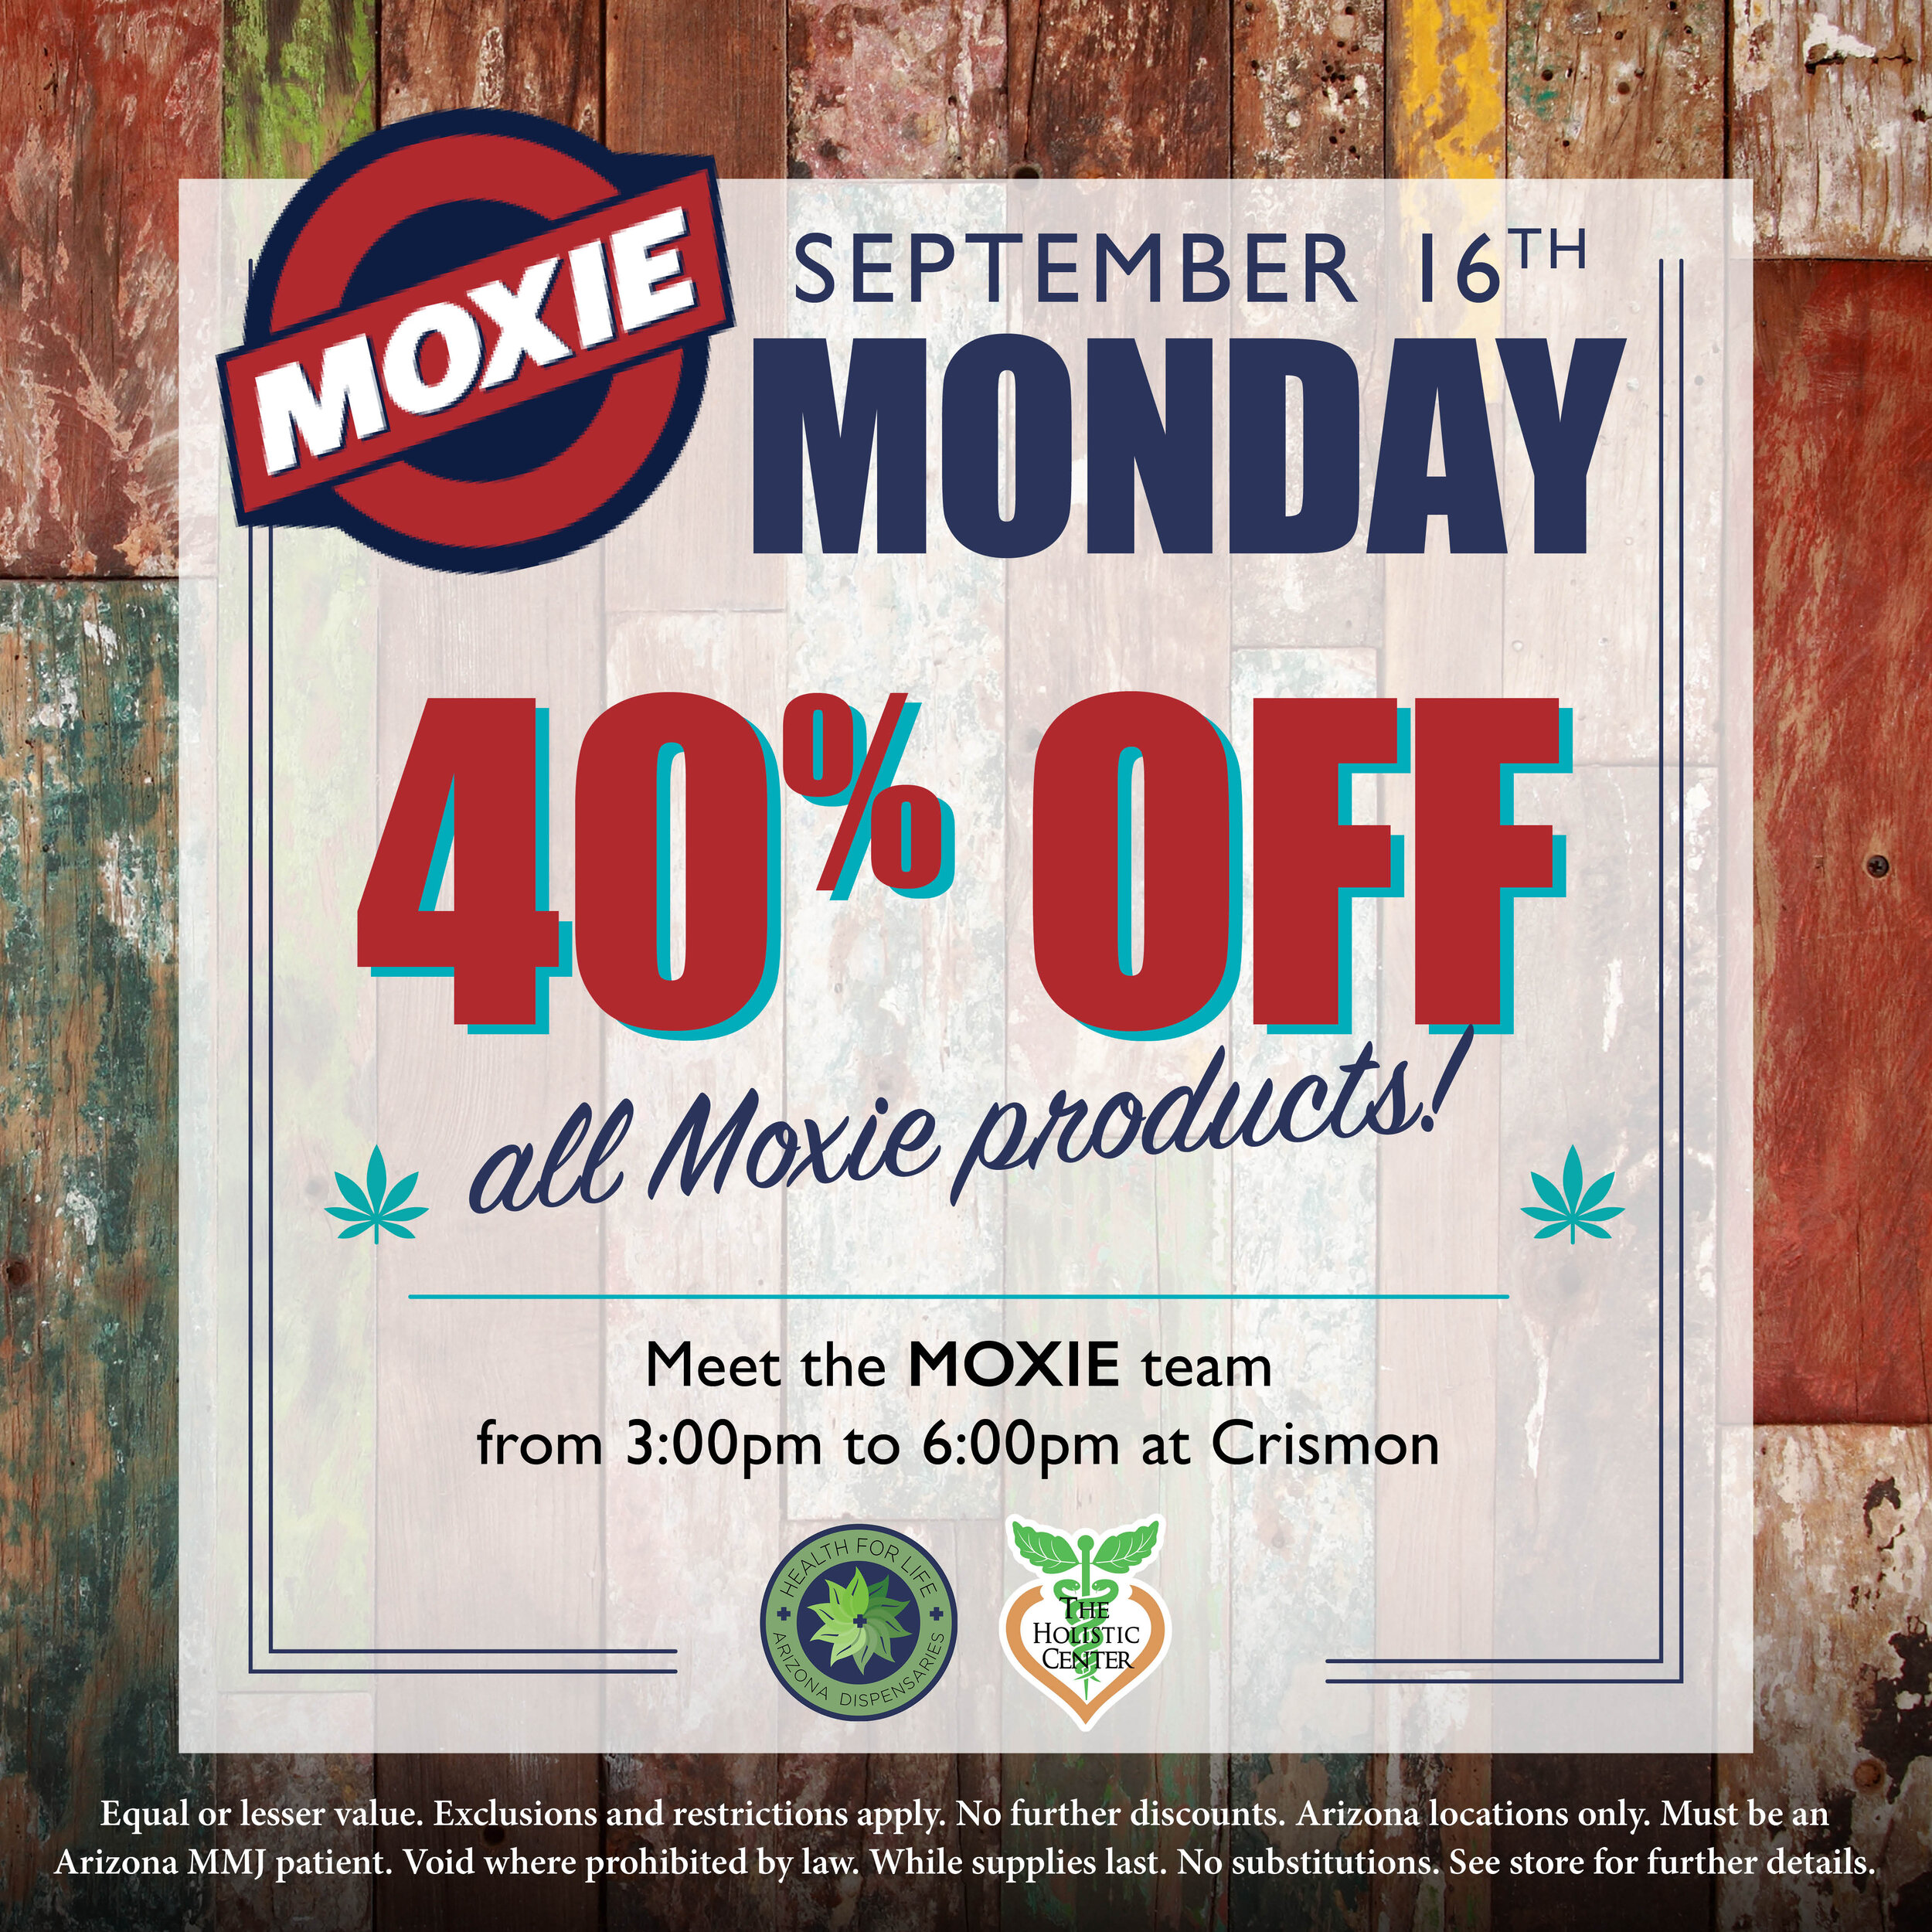 Save on Moxie!